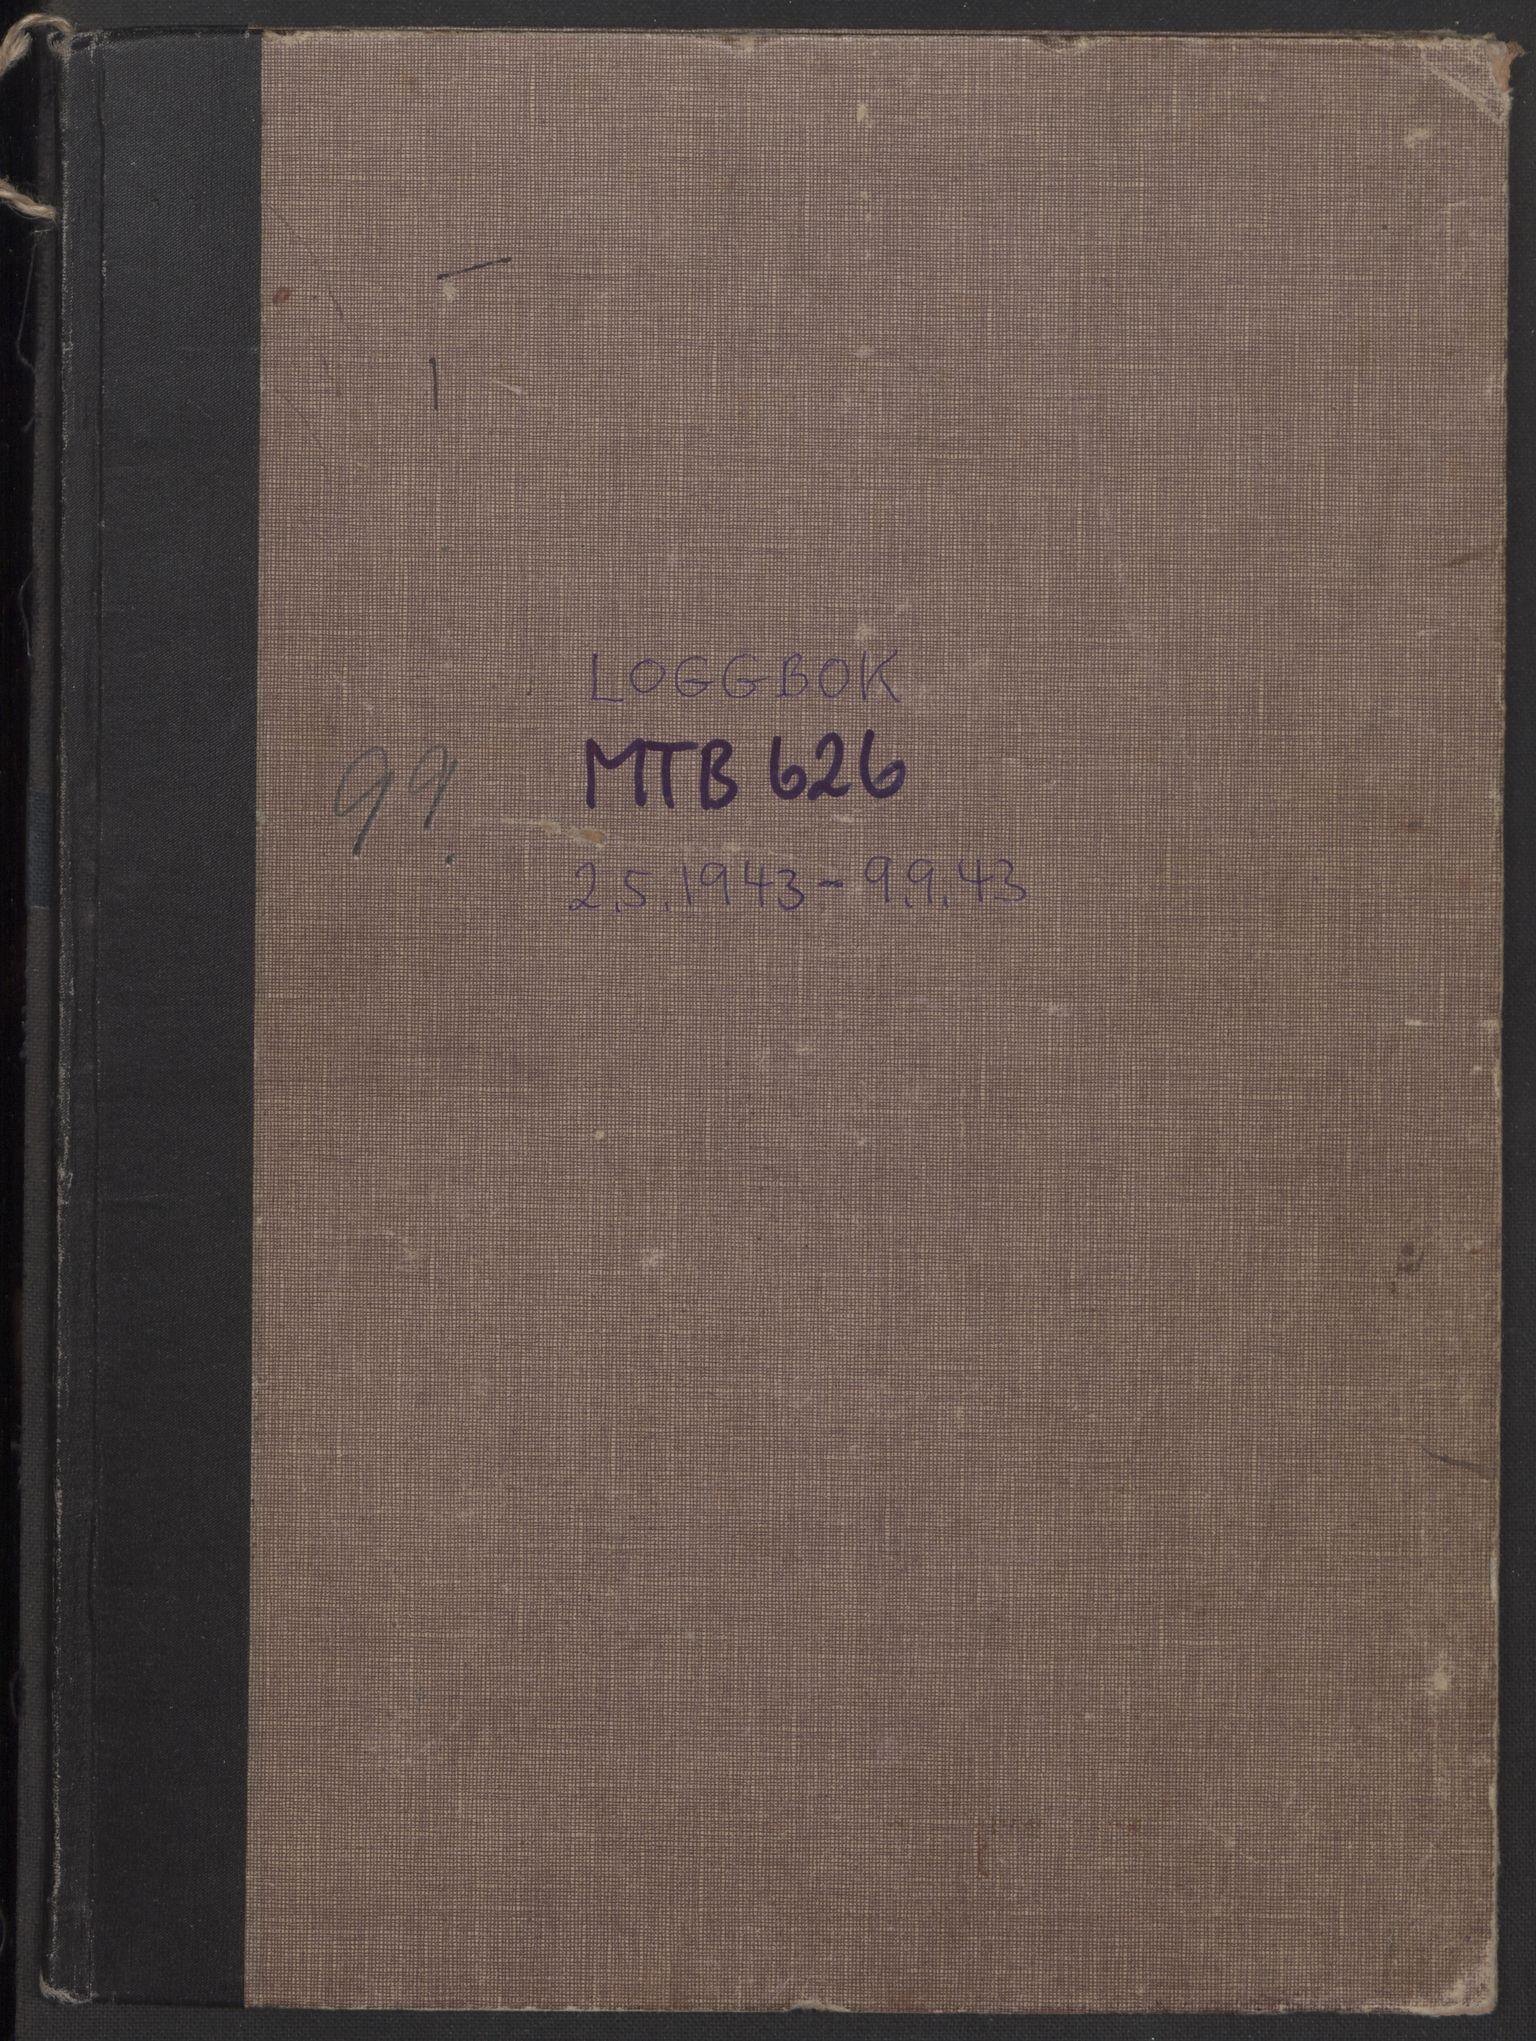 RA, Forsvaret, Sjøforsvarets fartøyer, Gm6/L0004: Loggbok, 1943